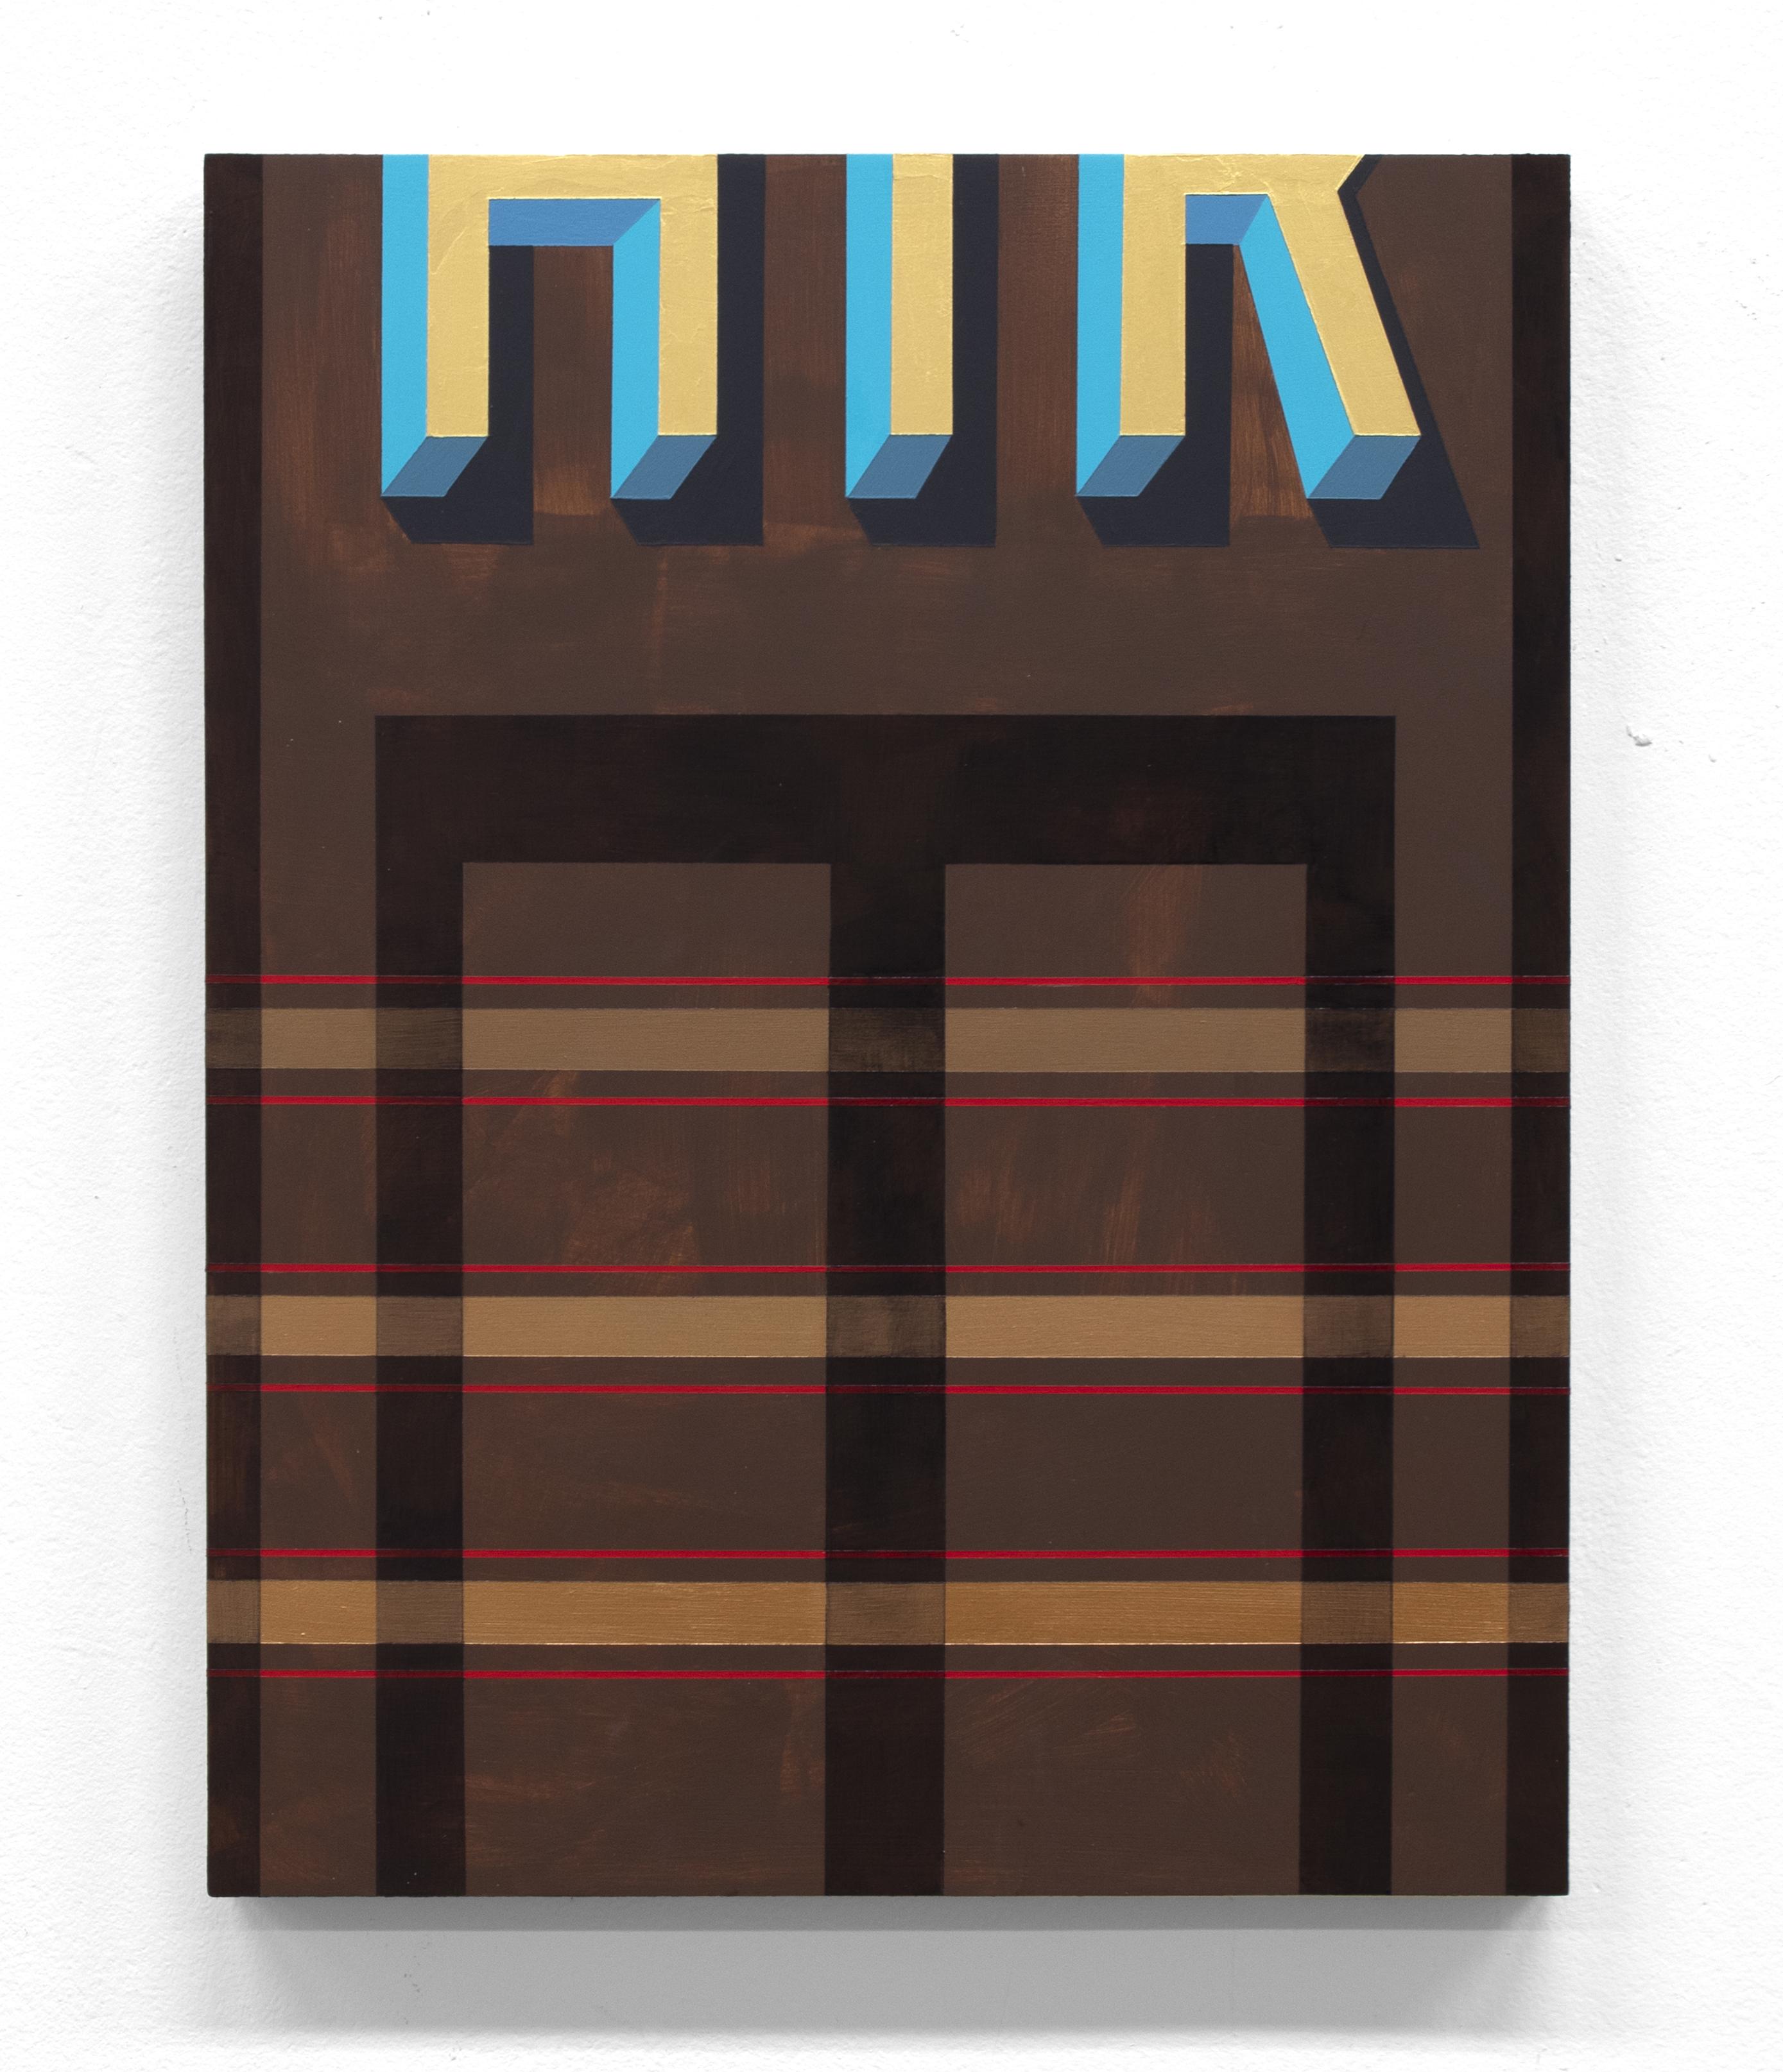 "Mary Laube, Narrow Gauge, Acrylic on panel, 15.25"" x 12"", 2017-18"